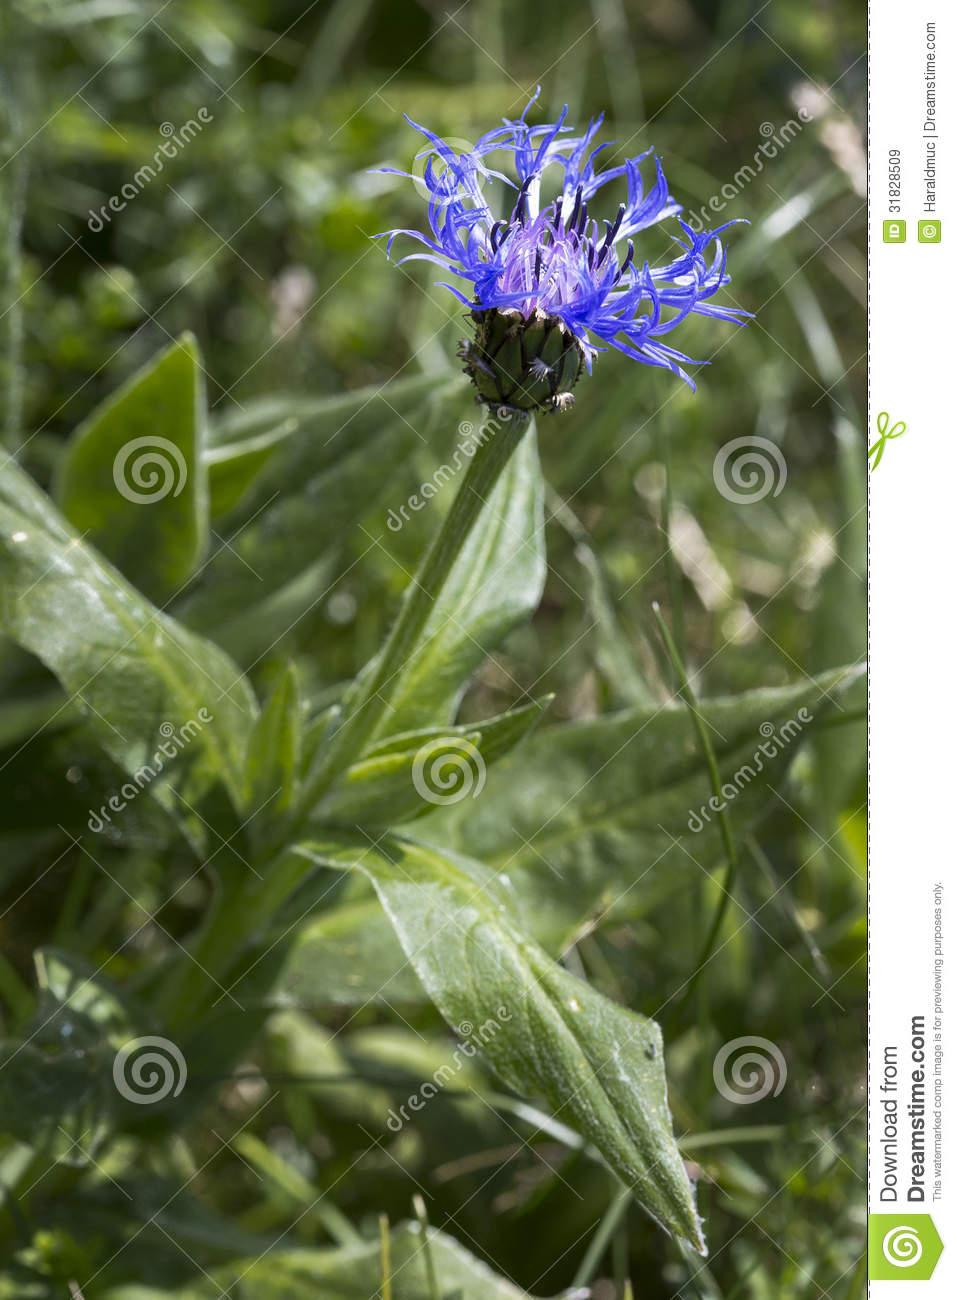 Centaurea Montana Flower Royalty Free Stock Images.